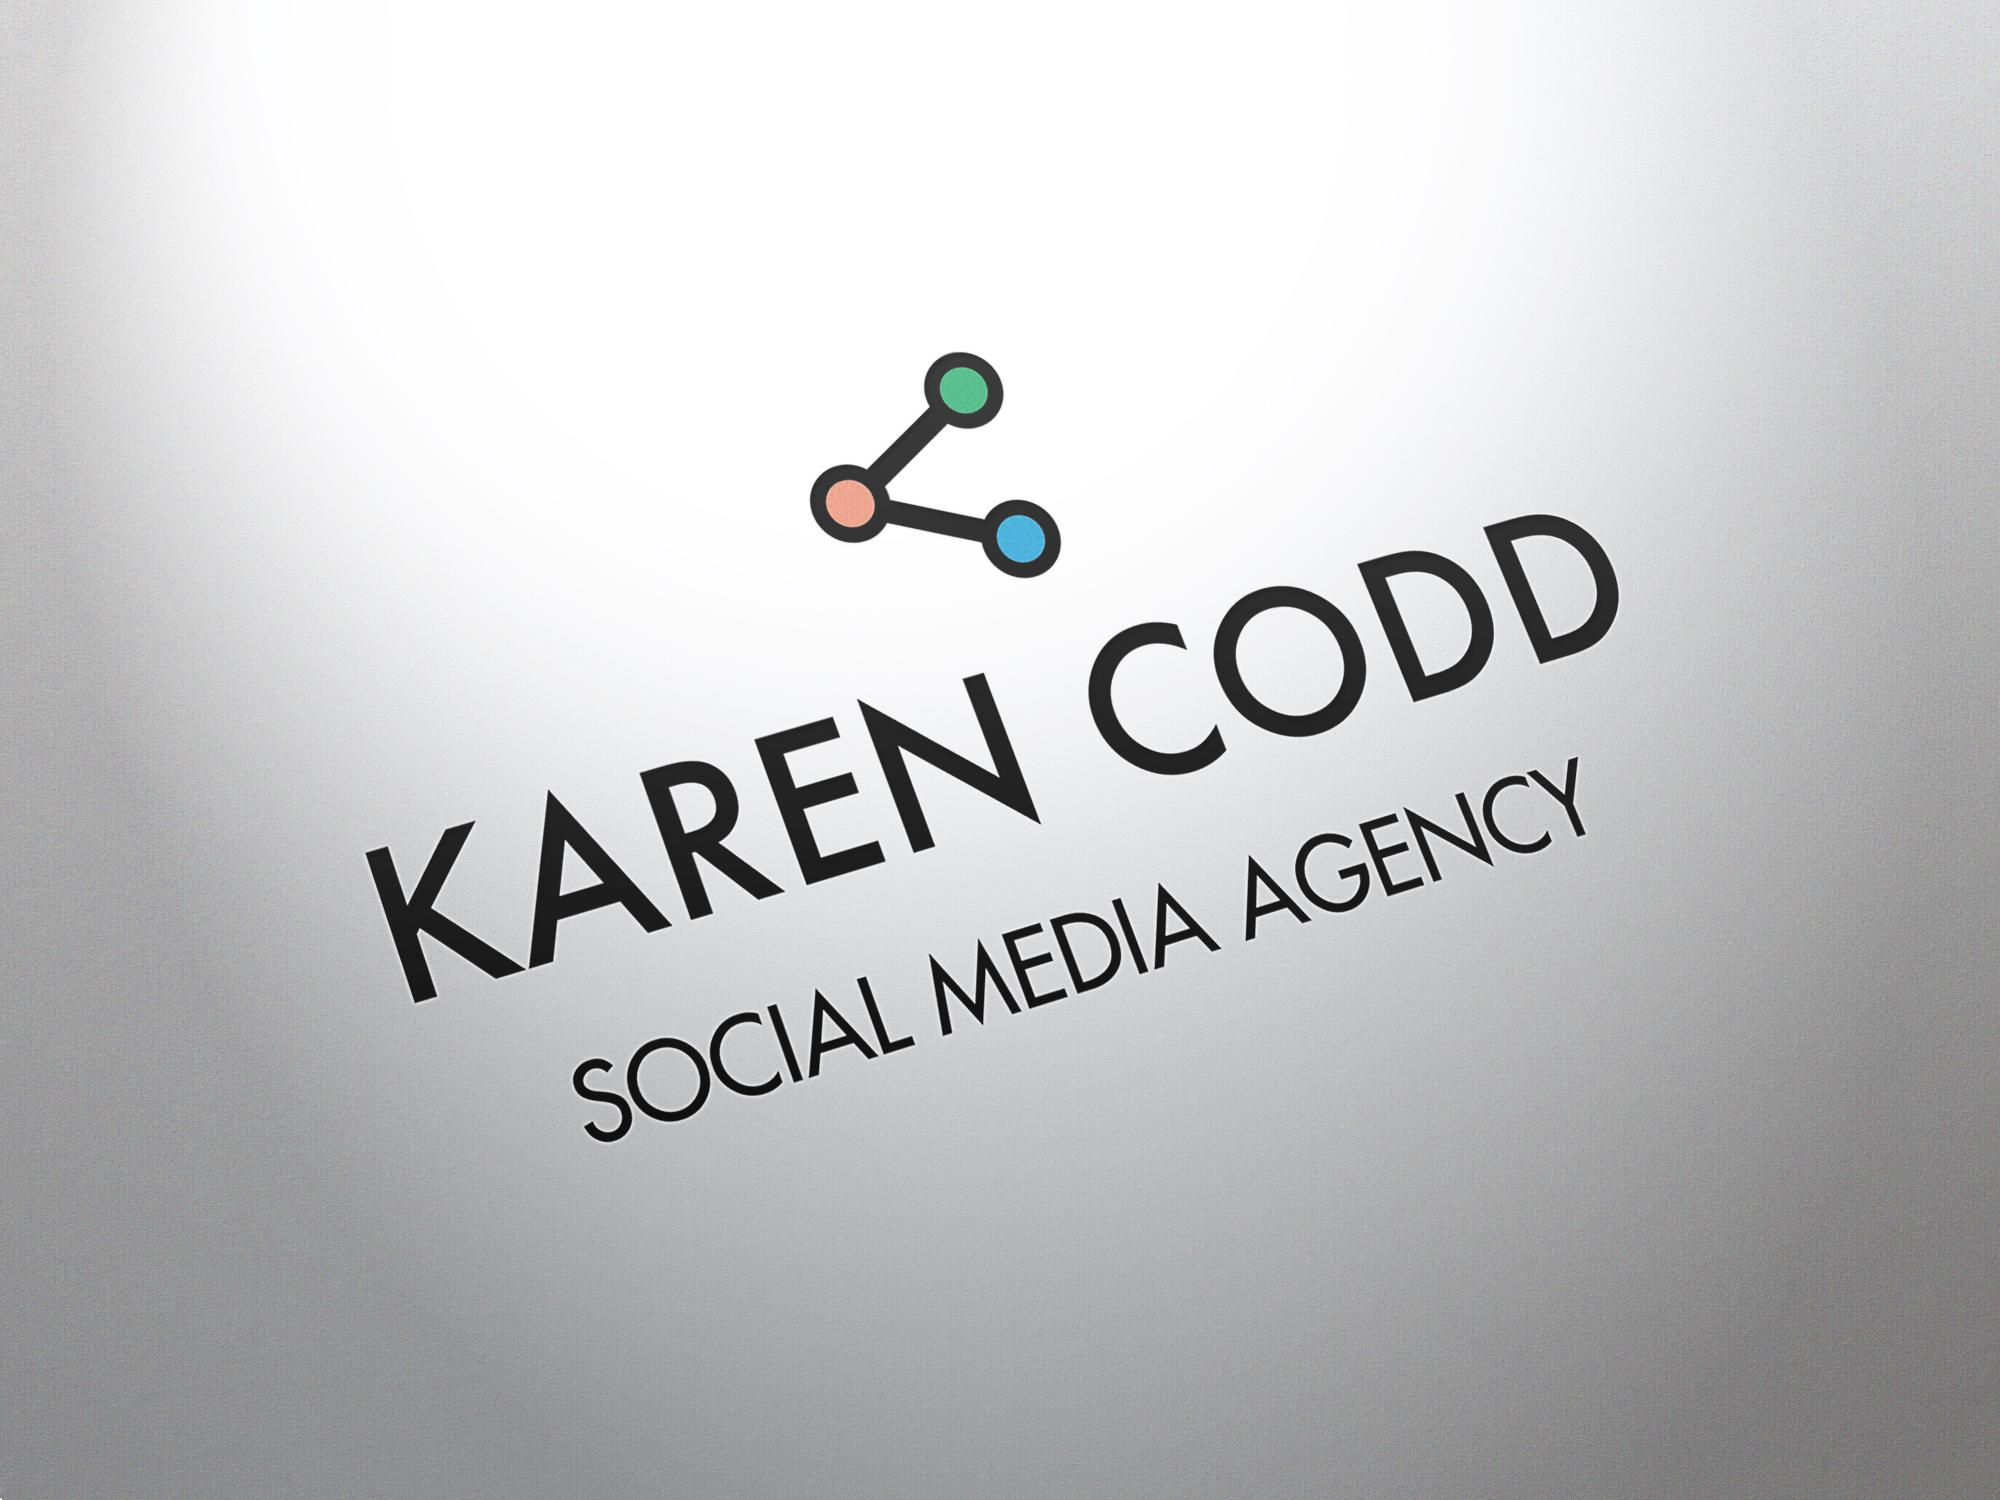 karen codd logo 06 - KAREN CODD